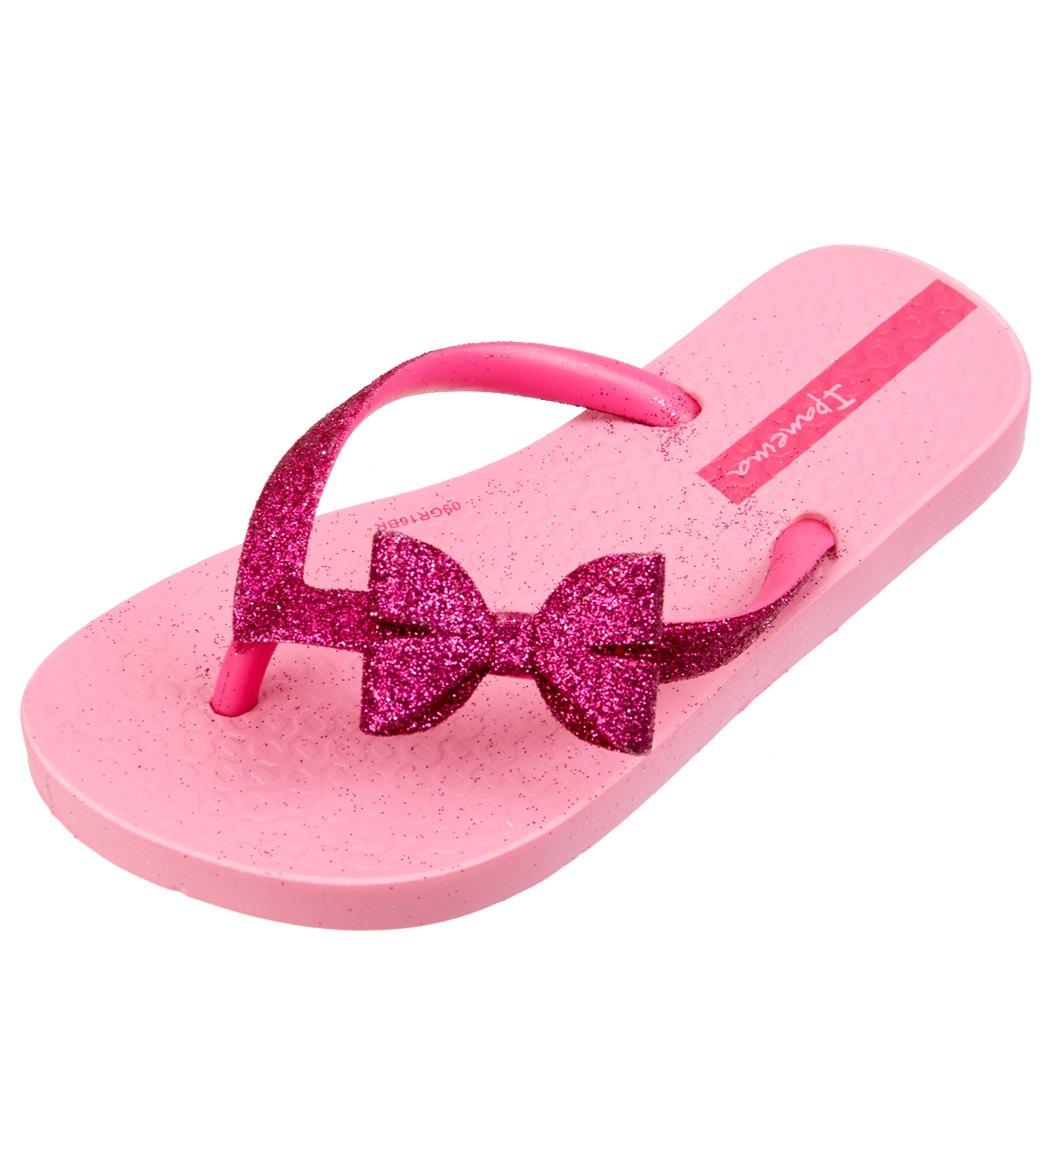 94e3750a295e64 Ipanema Girl s Glitter Kids Sandal IV at SwimOutlet.com